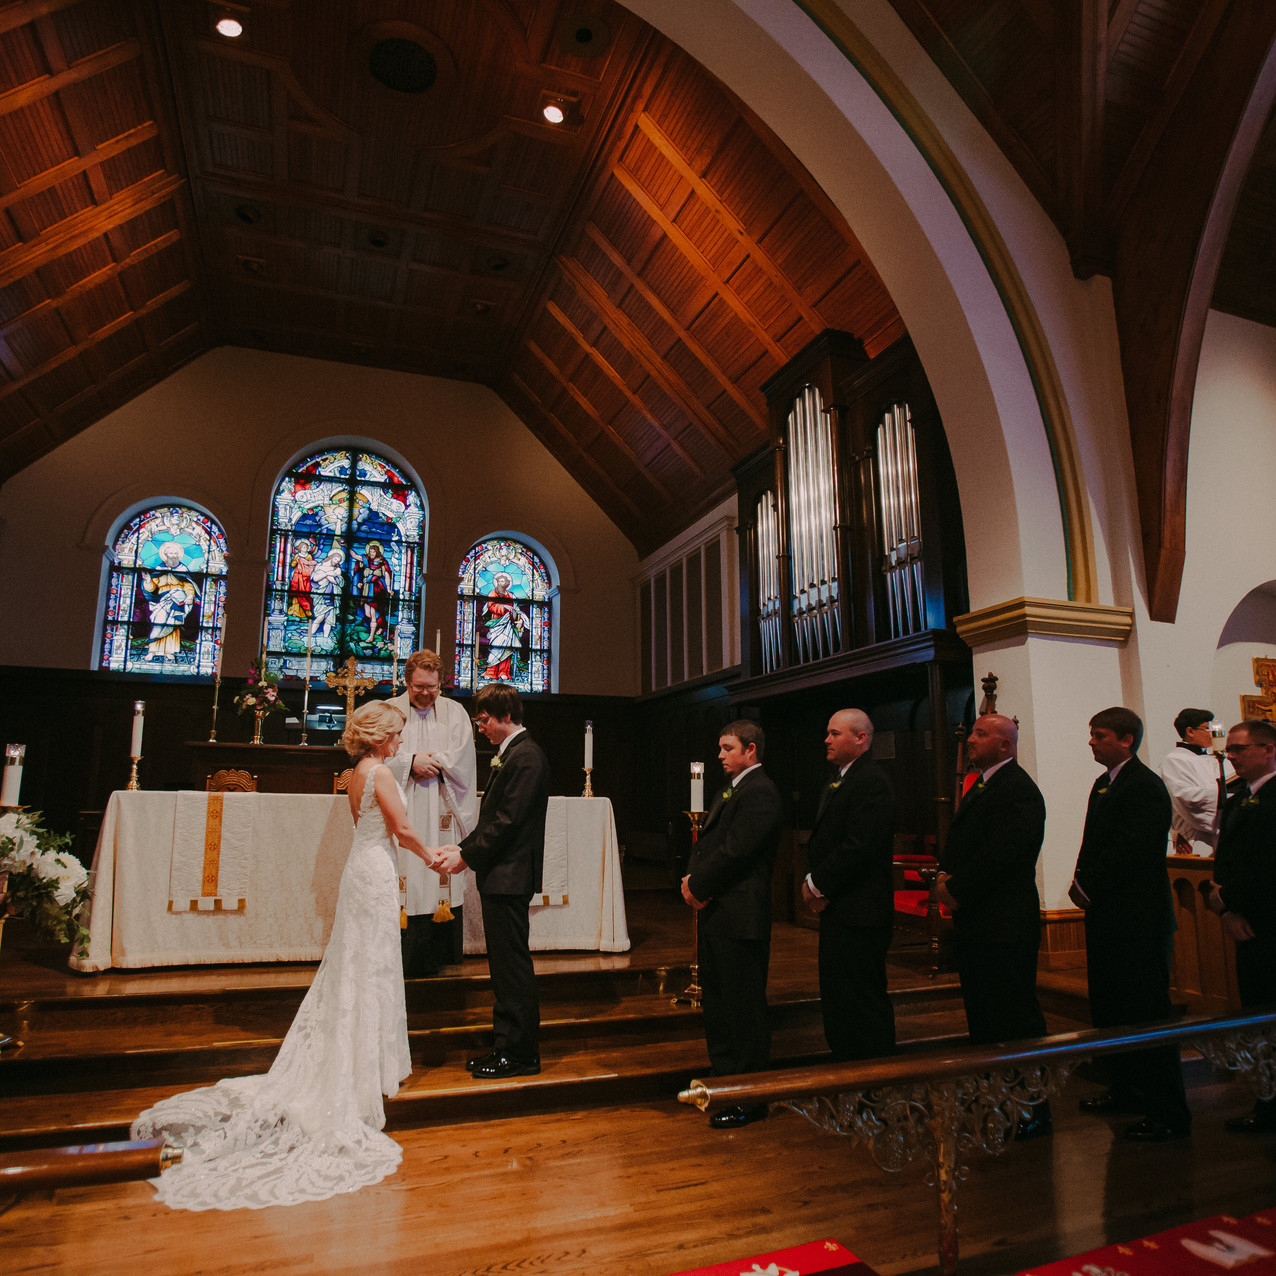 A wedding ceremony in Oshkosh Wisconsin